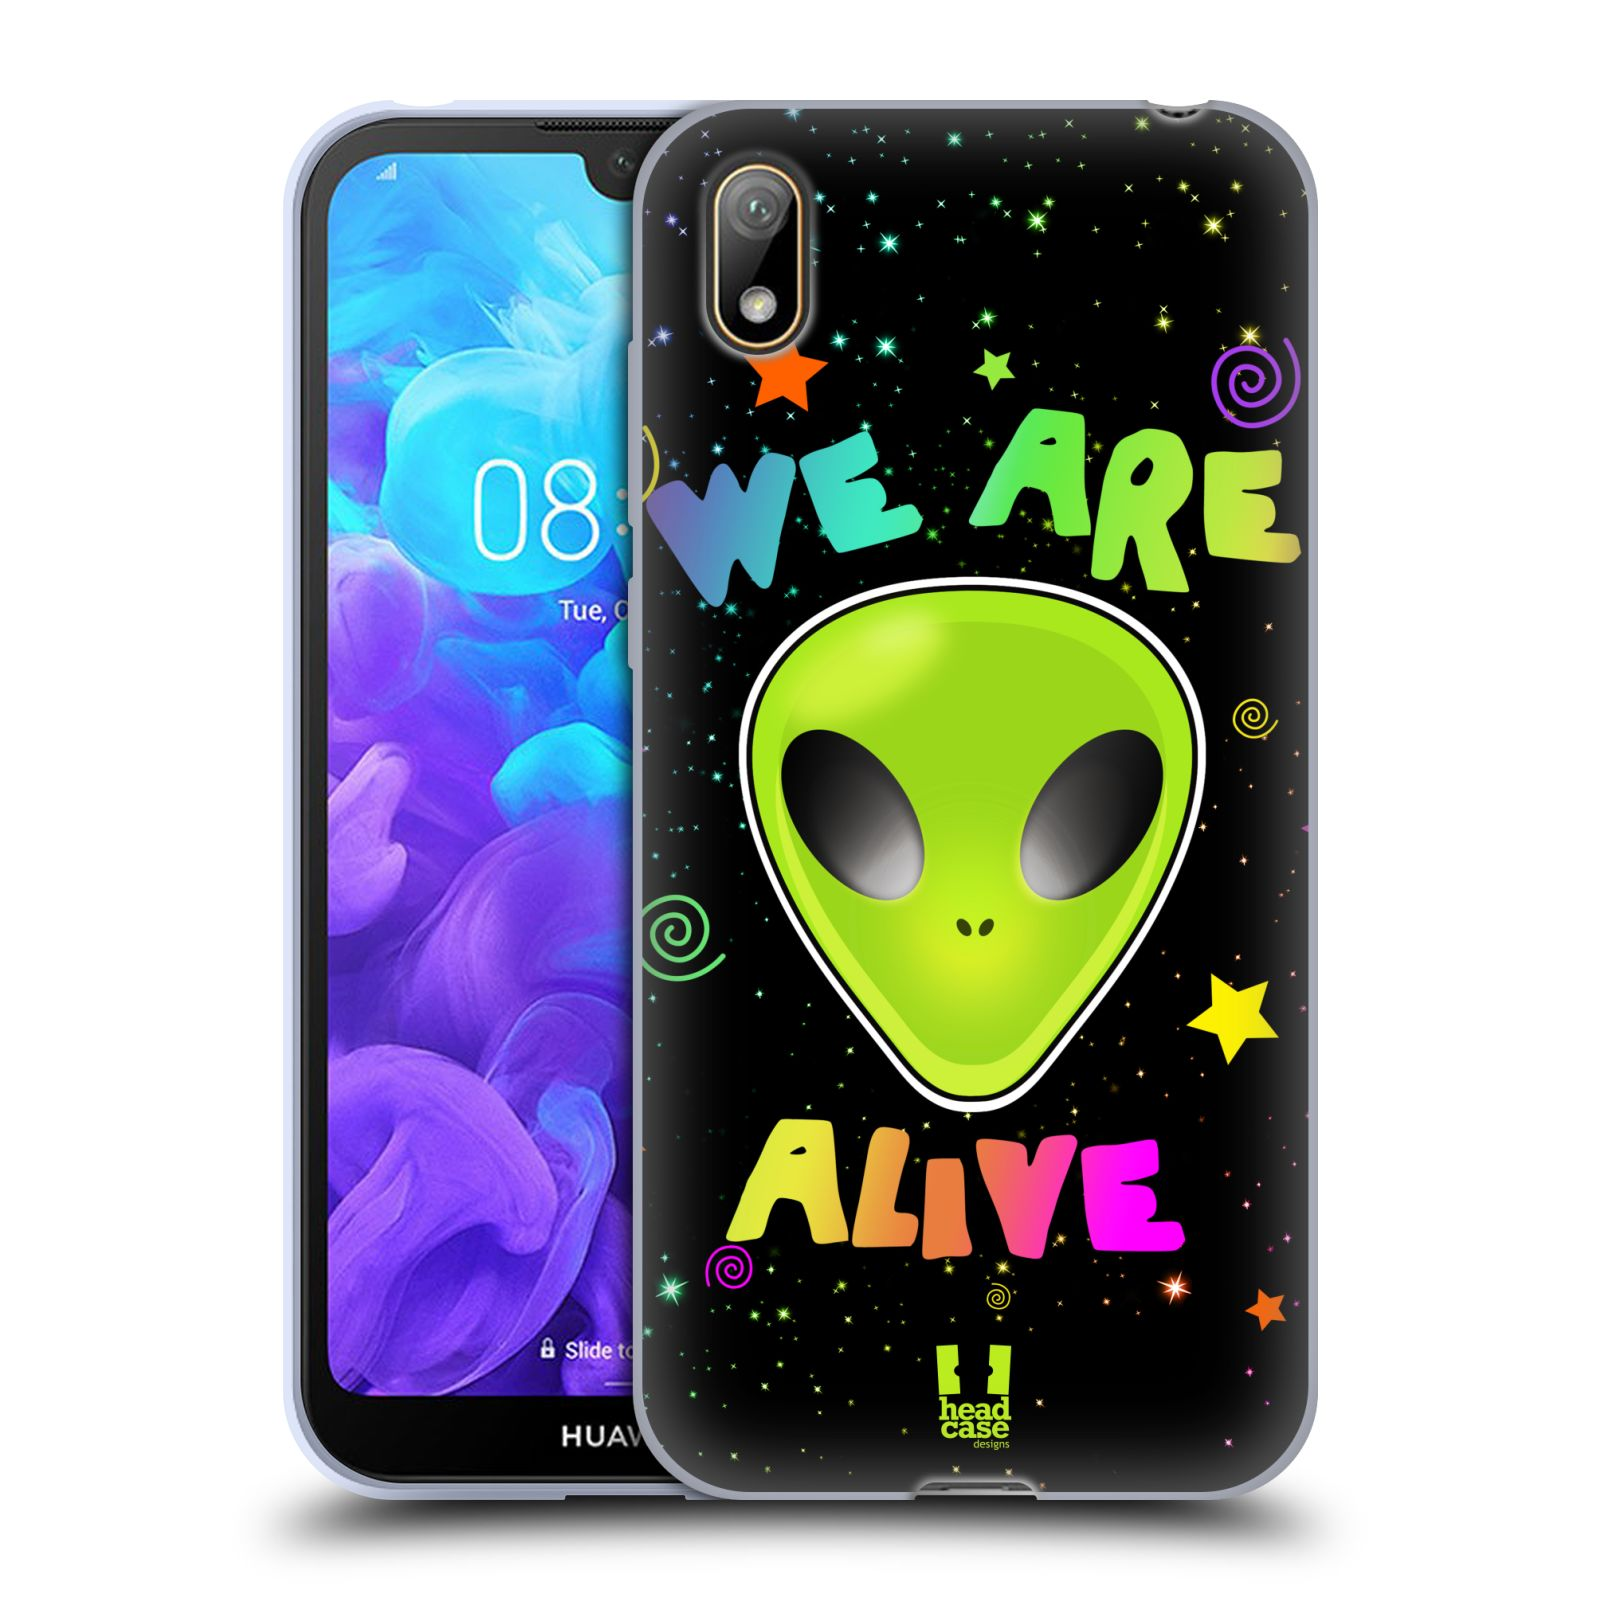 Silikonové pouzdro na mobil Huawei Y5 (2019) - Head Case - ALIENS ALIVE